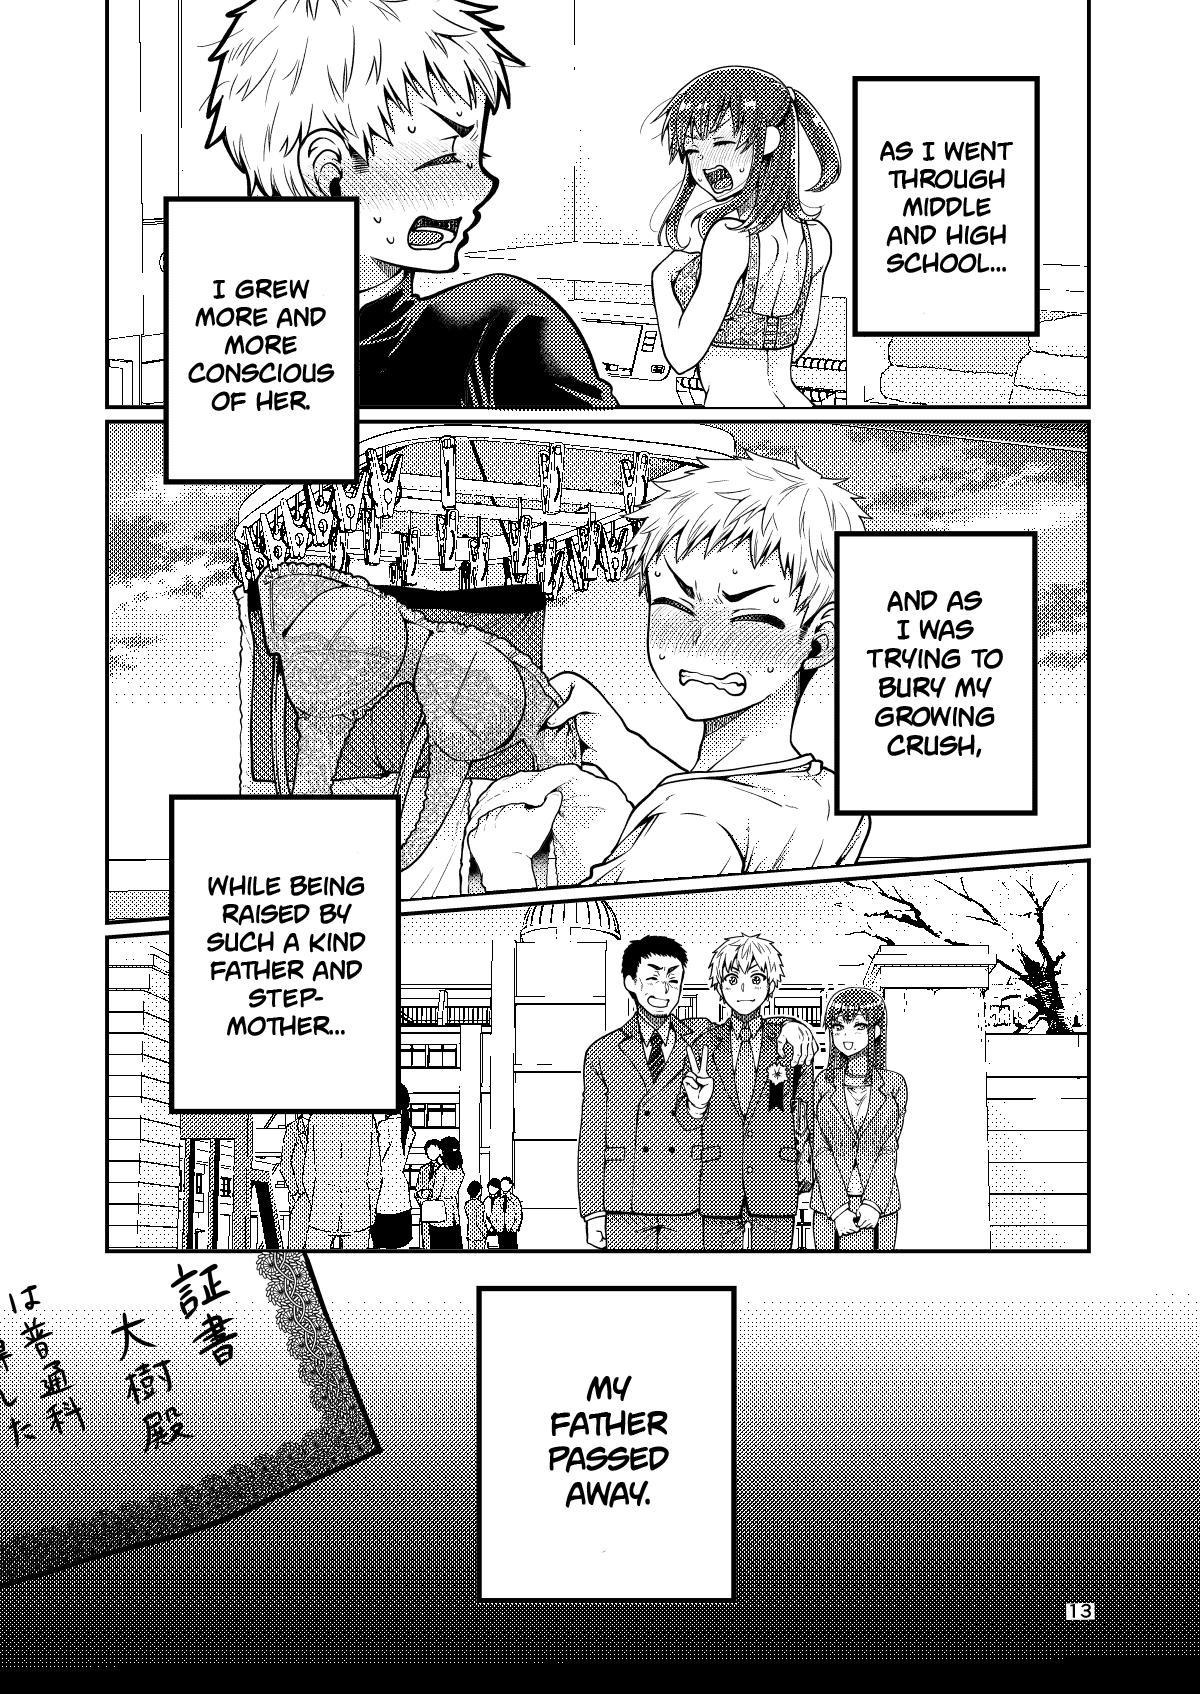 [ErotIs (Narita Koh)] Kaa-san to Issho | Together with my Step-Mum [English] [Scansforhumanity] [Digital] 13